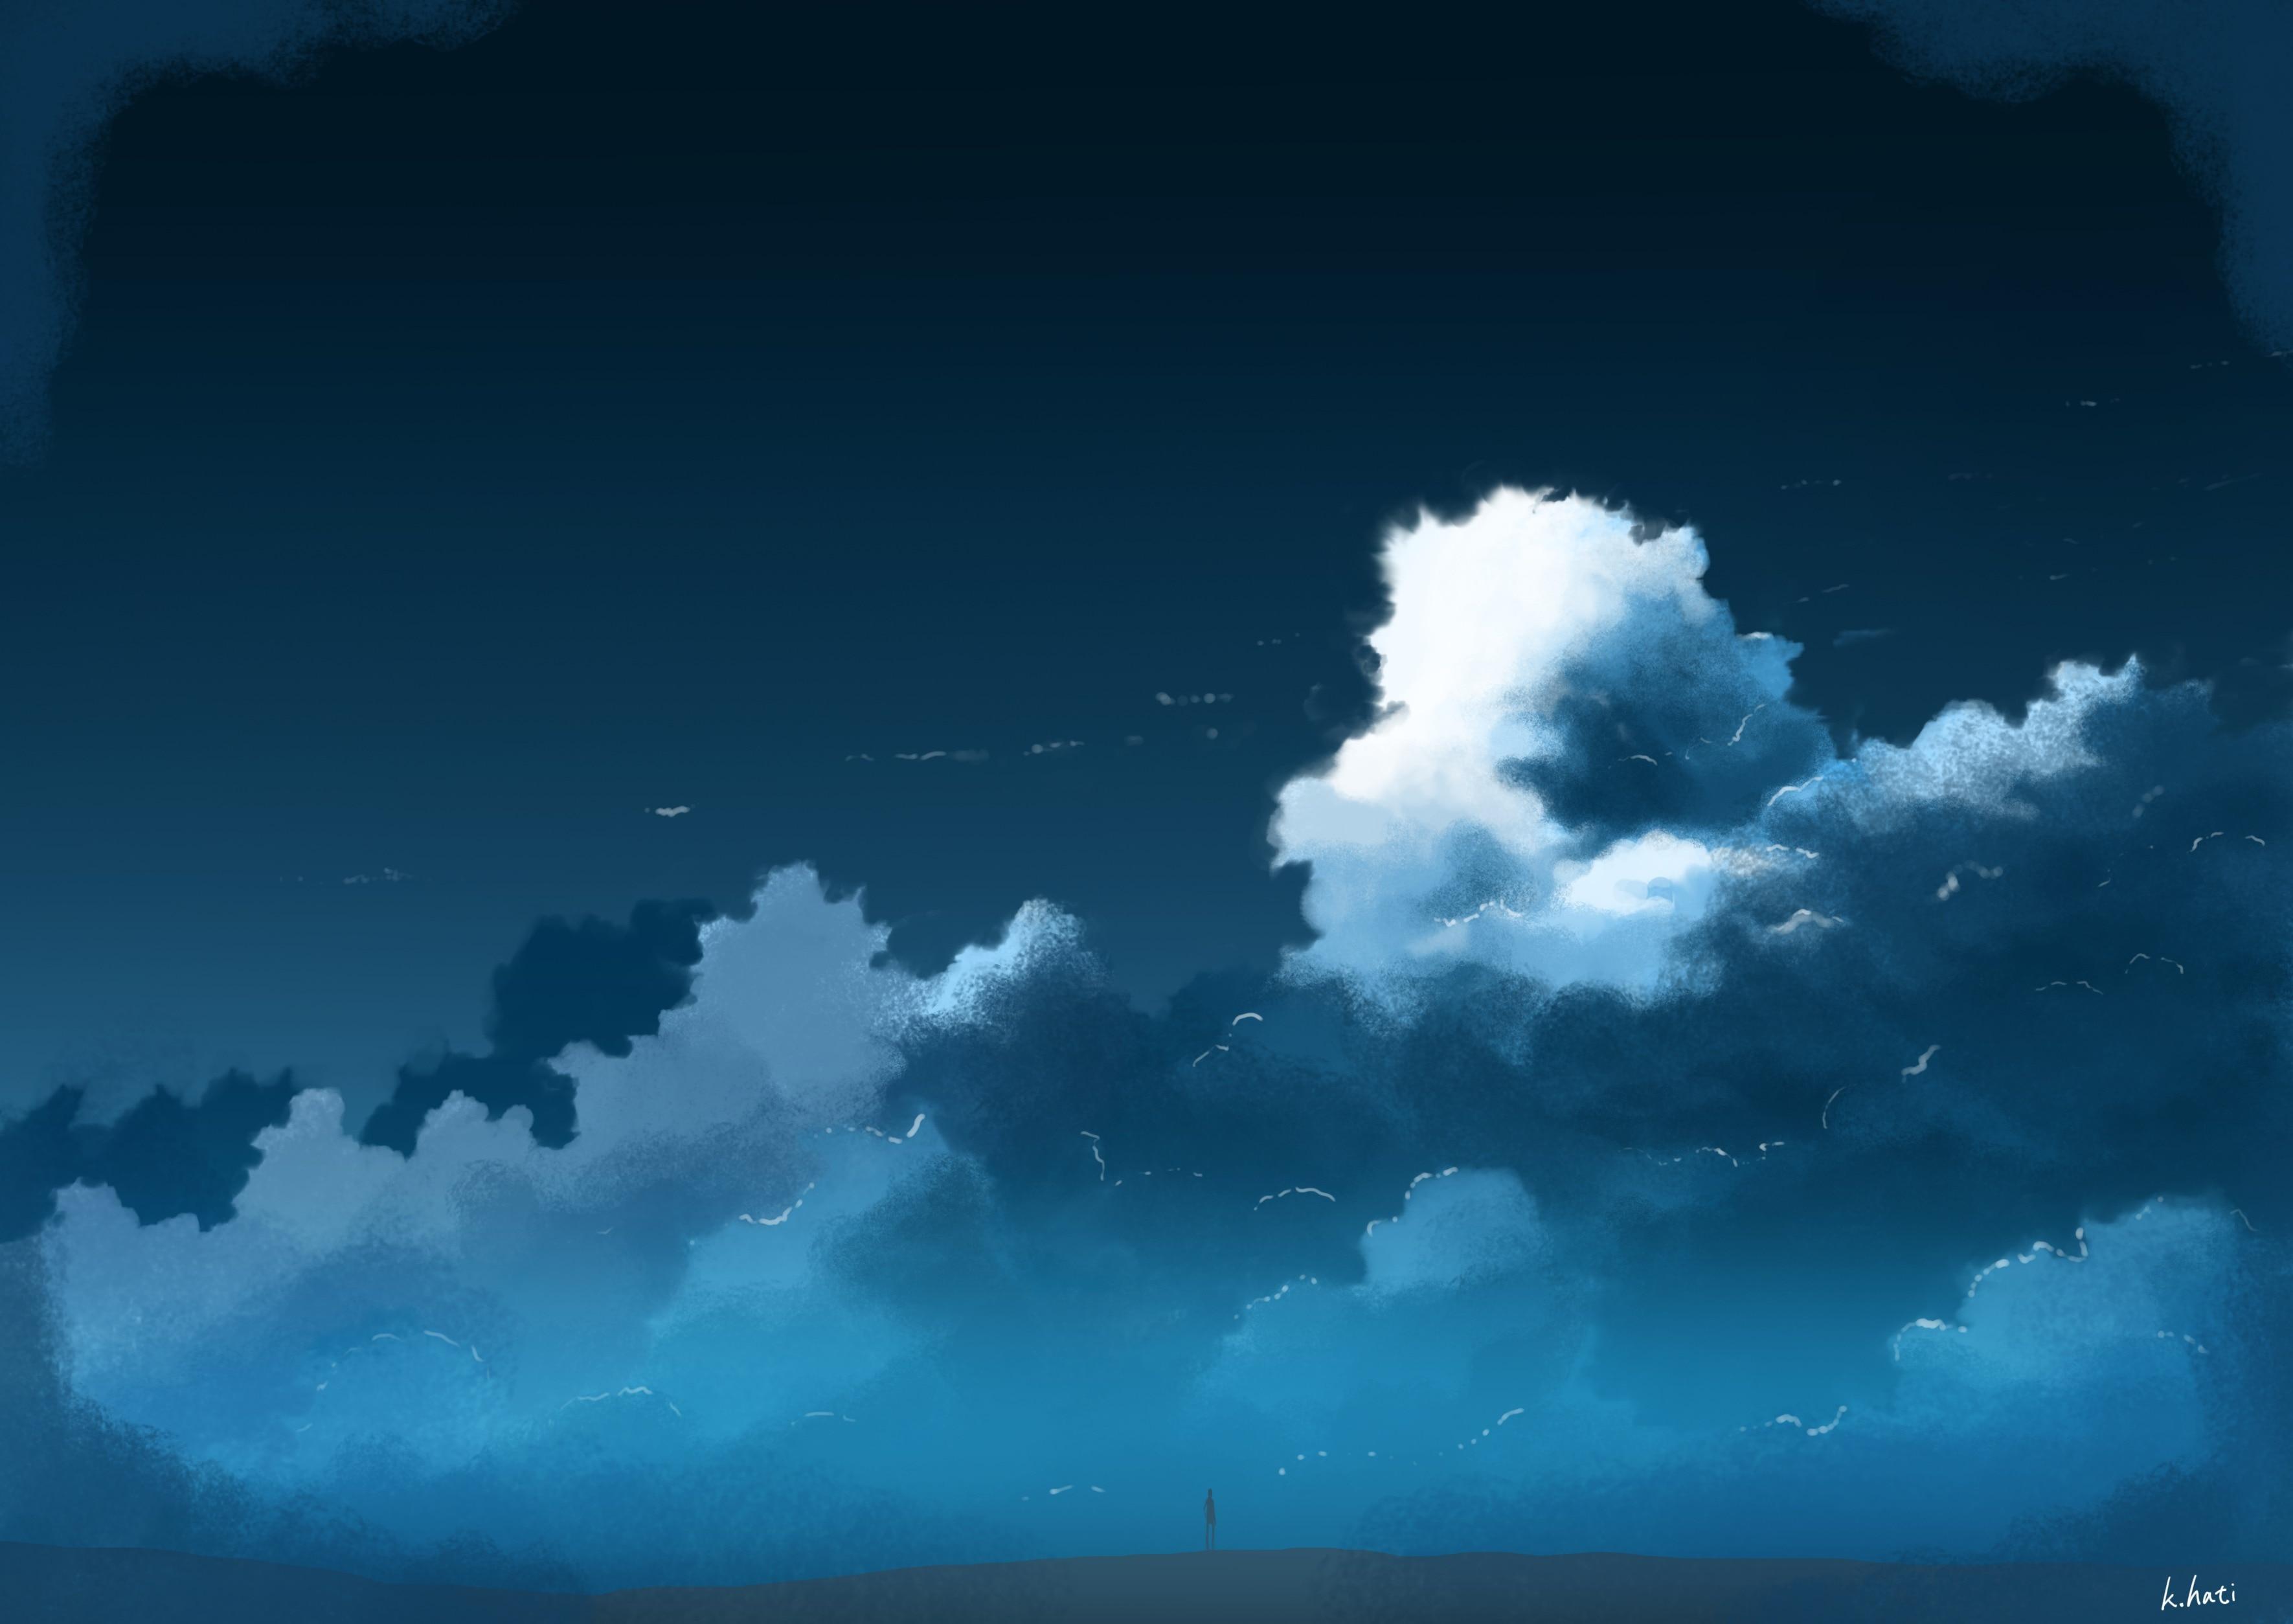 【P站画师】日本画师K.Hati的插画作品,来看风景吧- ACG17.COM